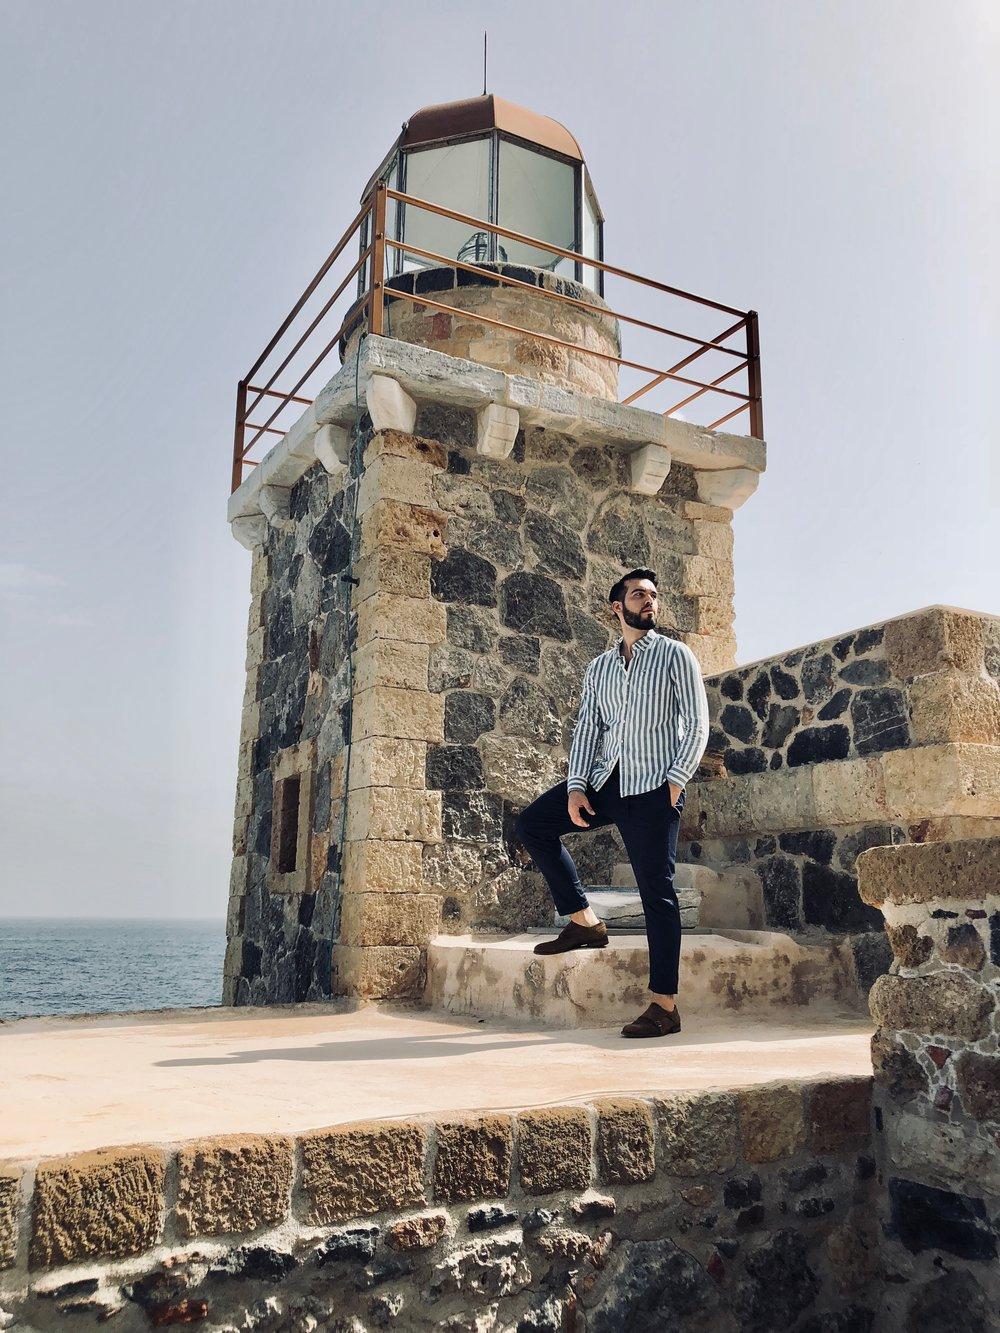 Shirt: Pepe Jeans / Pants: Antony Morato